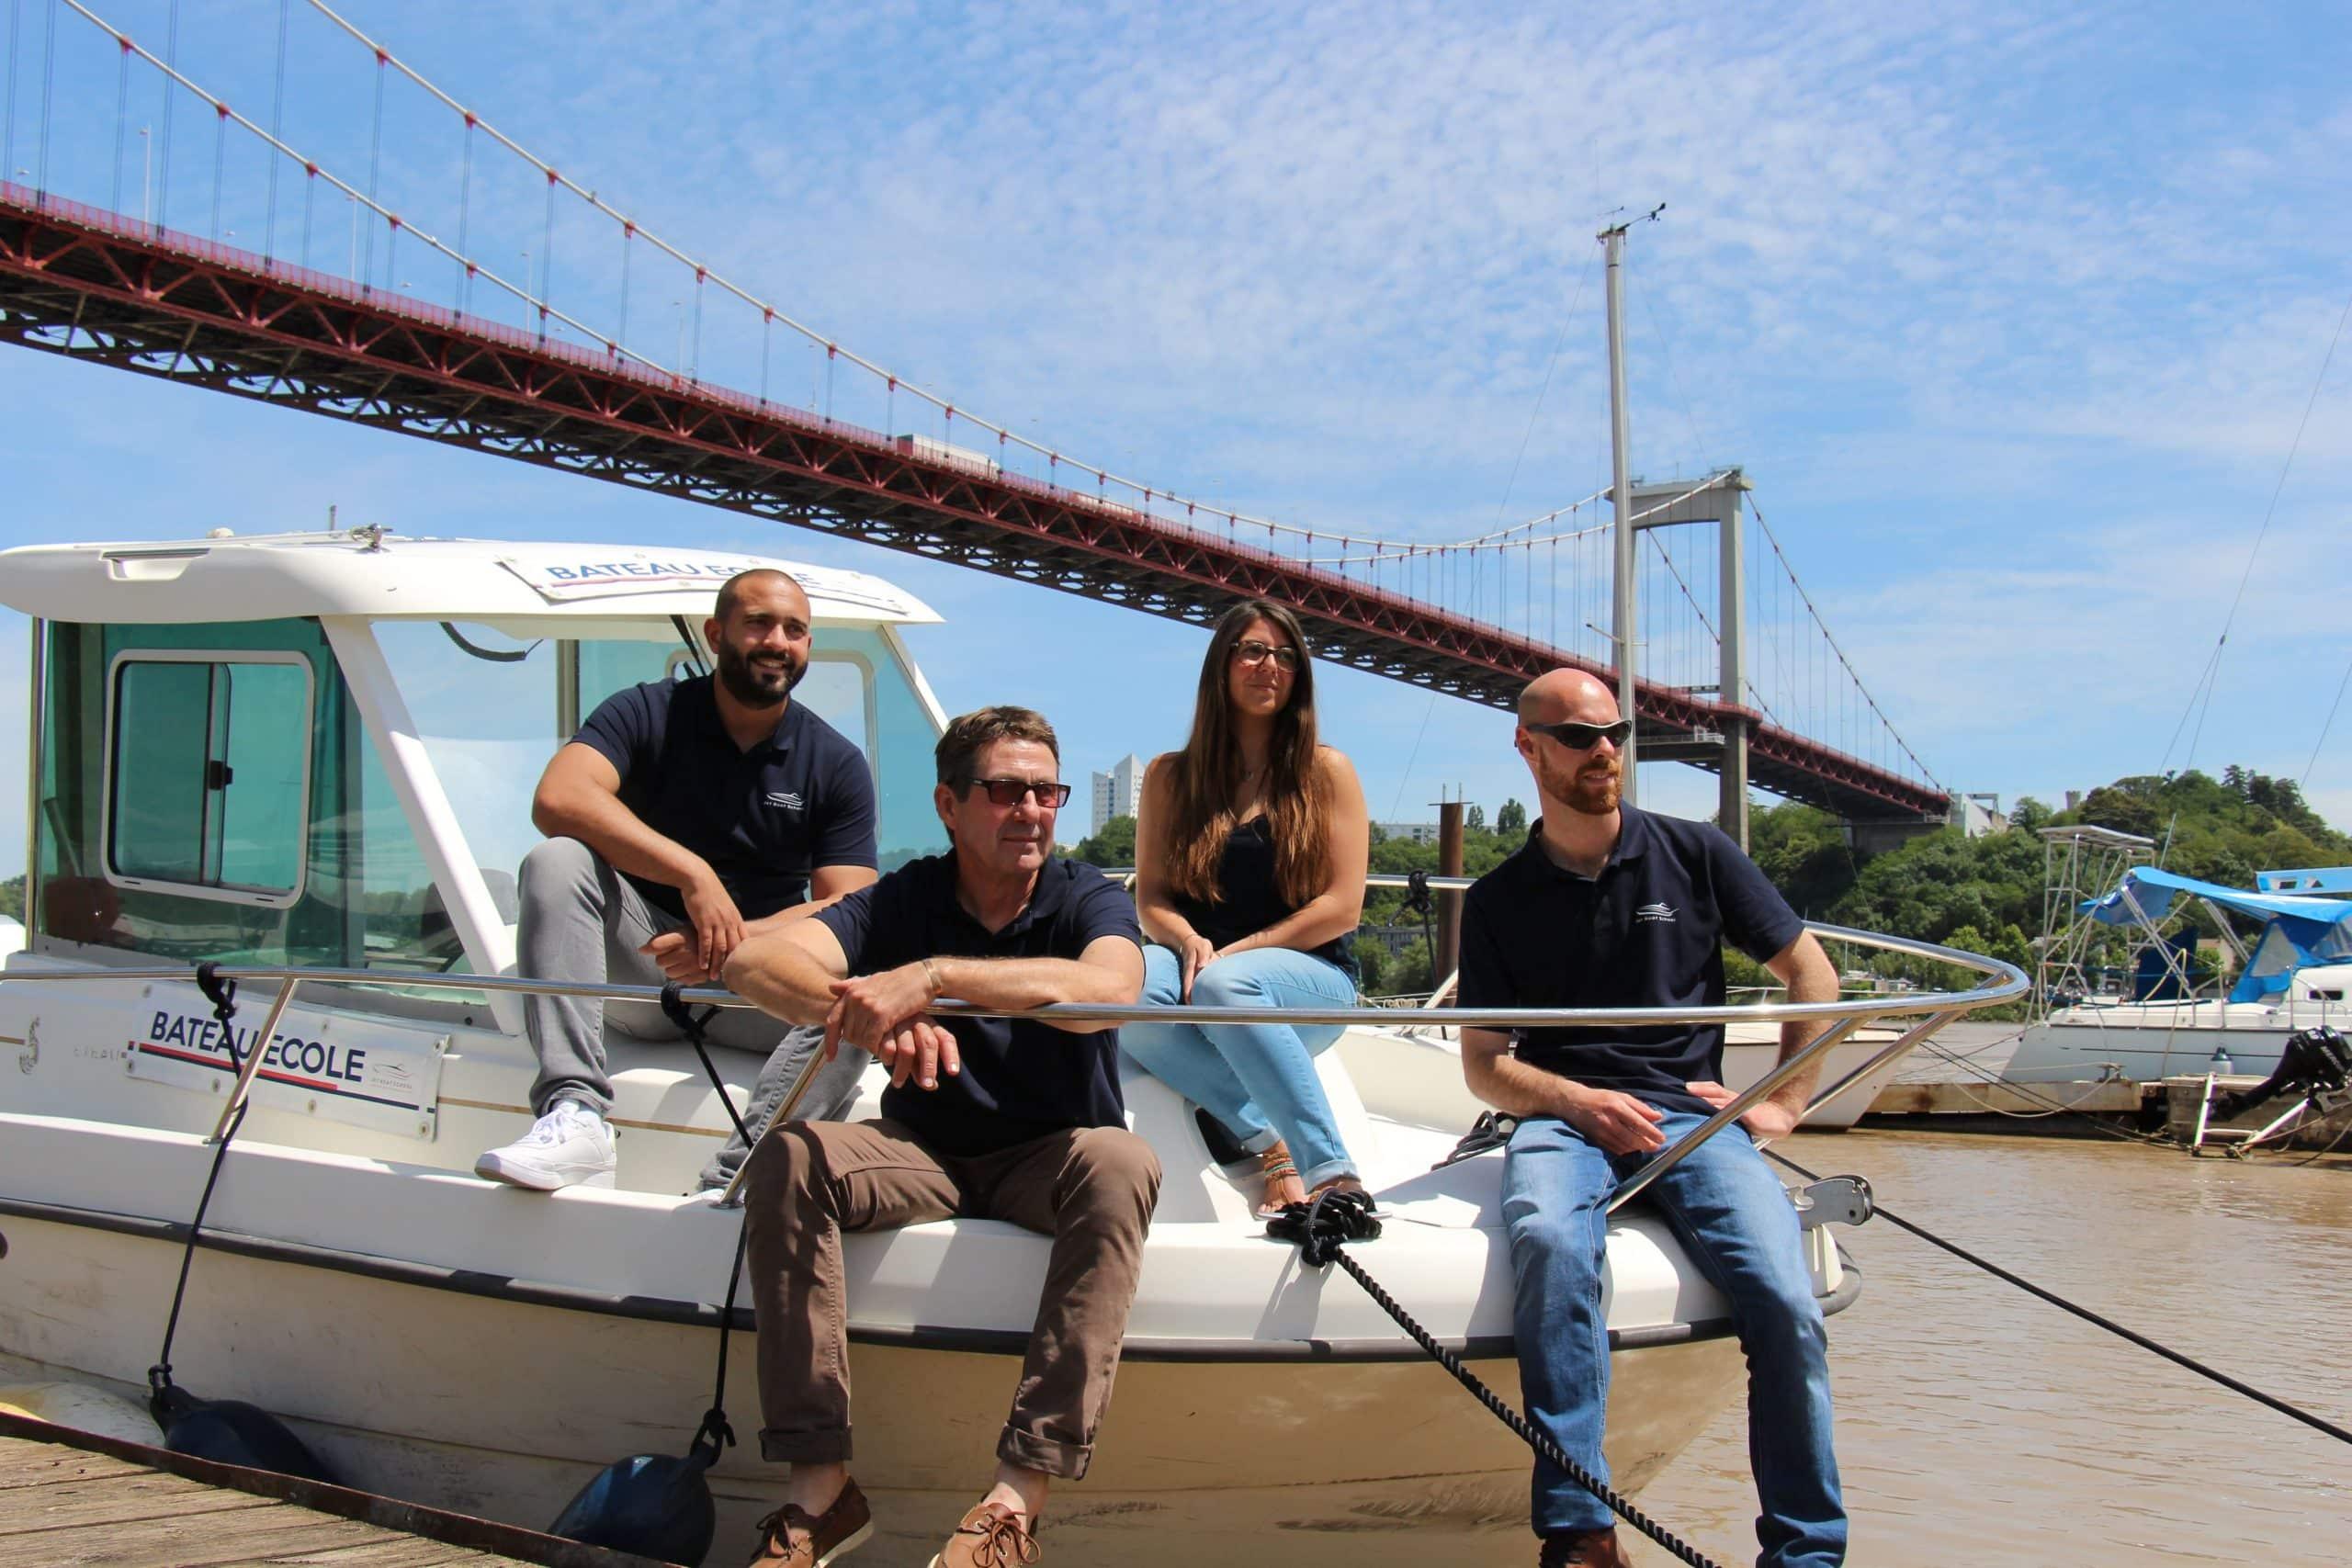 equipe-jet-boat-school-scaled